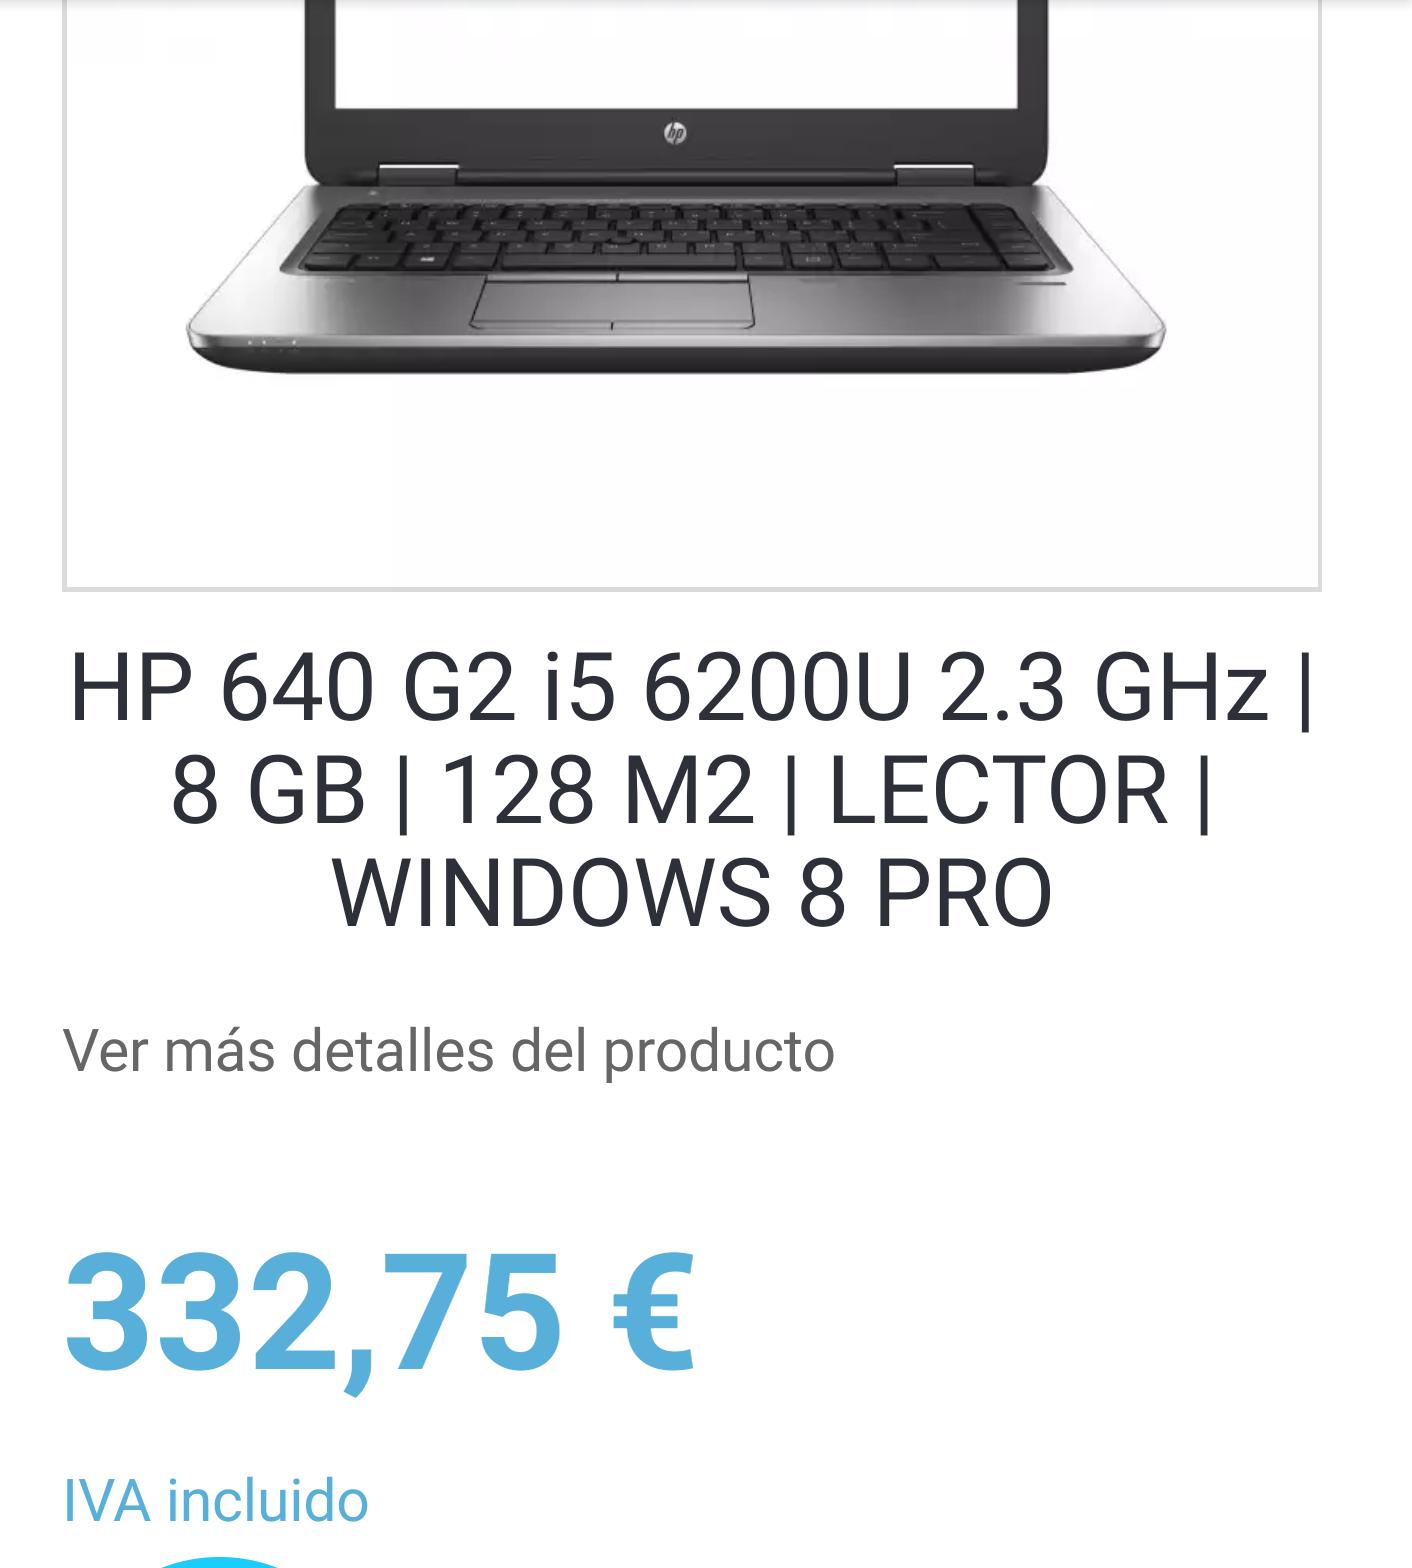 2504990-meWxf.jpg